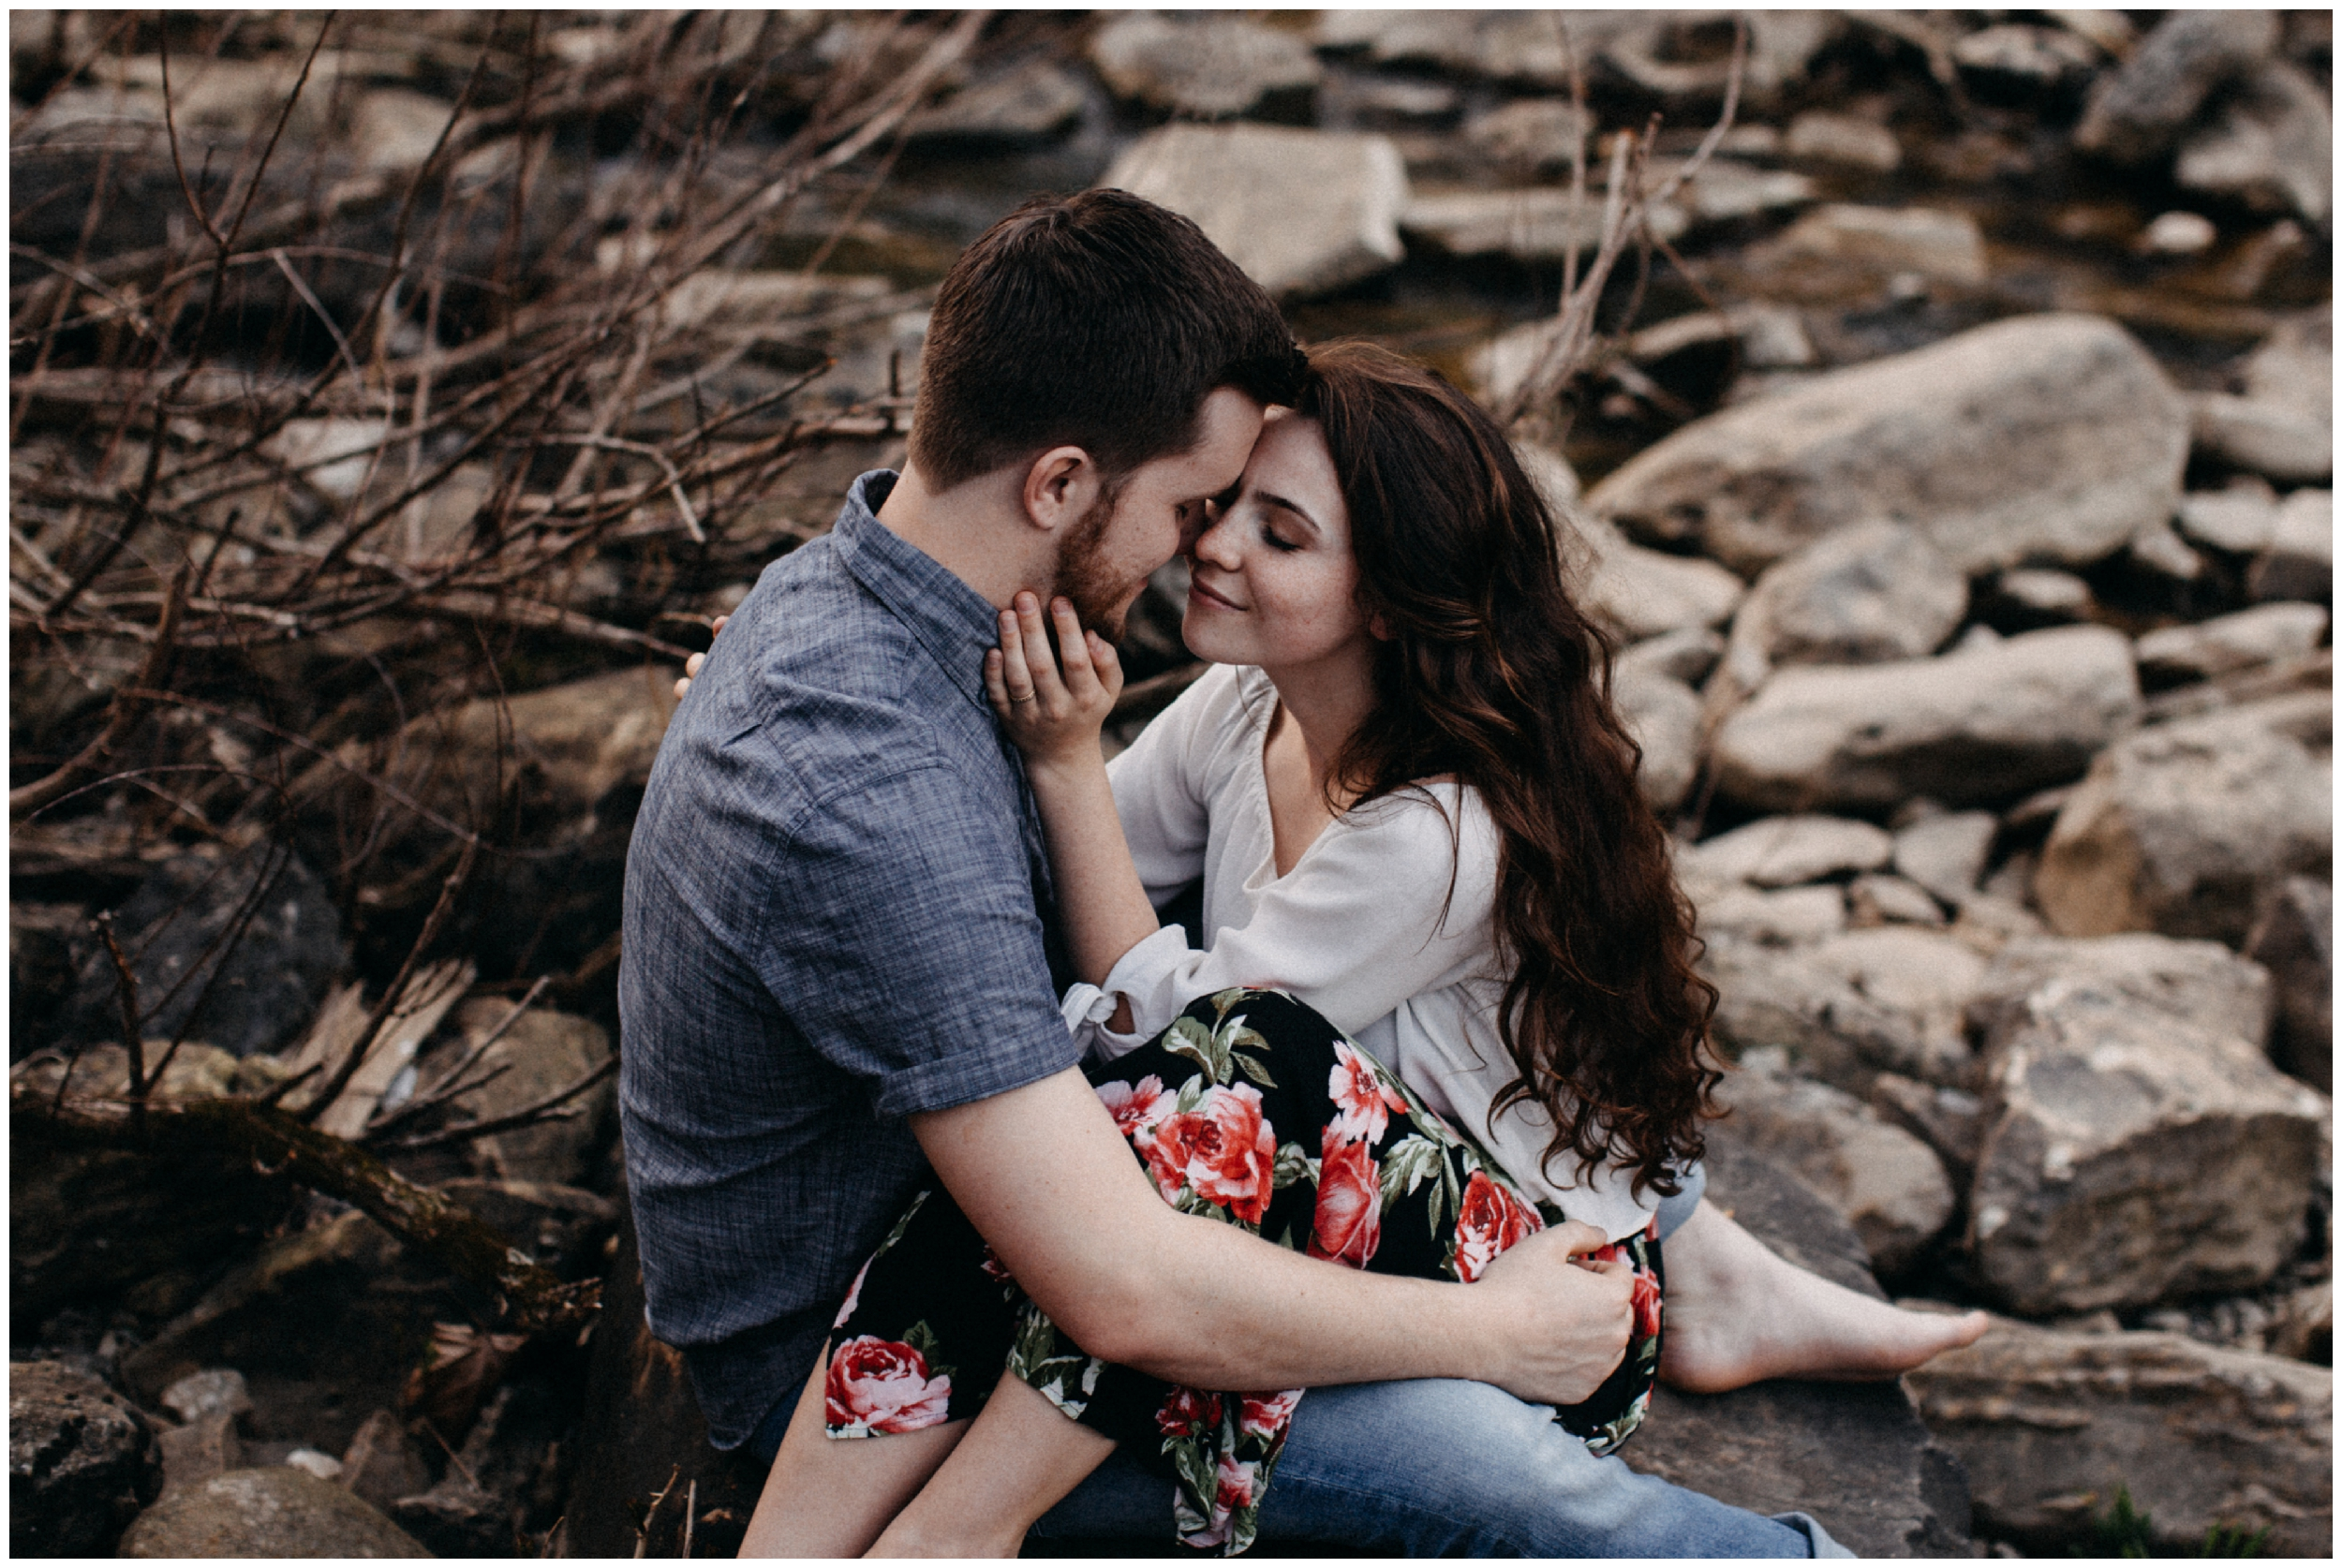 Destination engagement session near Nashville, TN photographed by travel wedding photographer Britt DeZeeuw